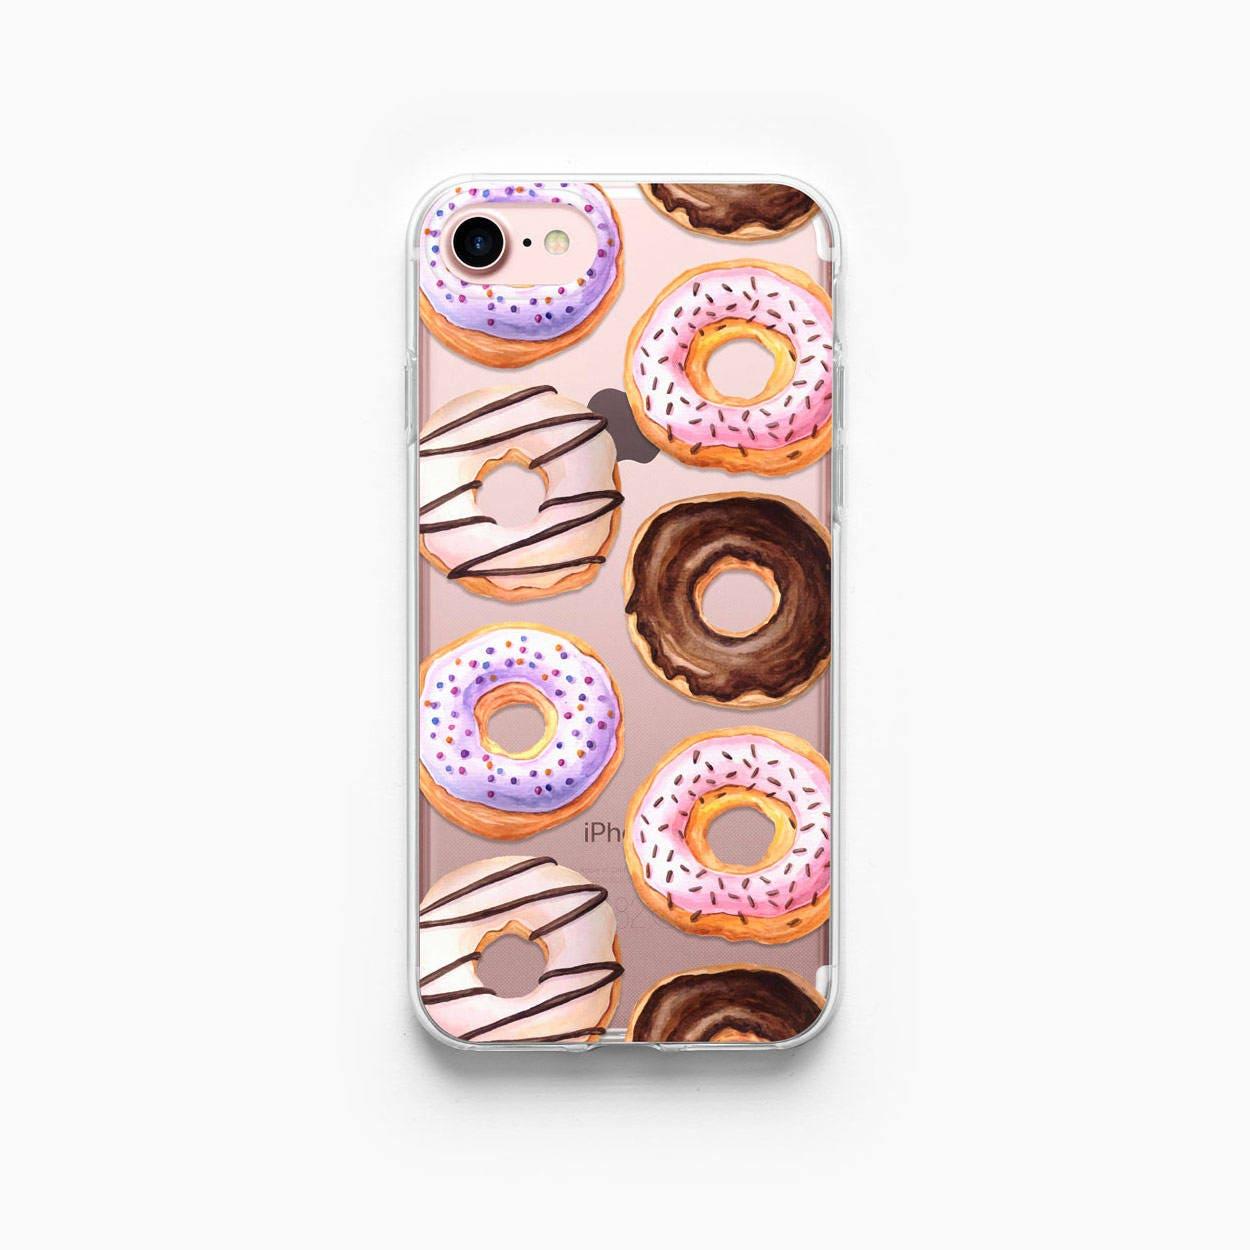 doughnut phone case iphone 7